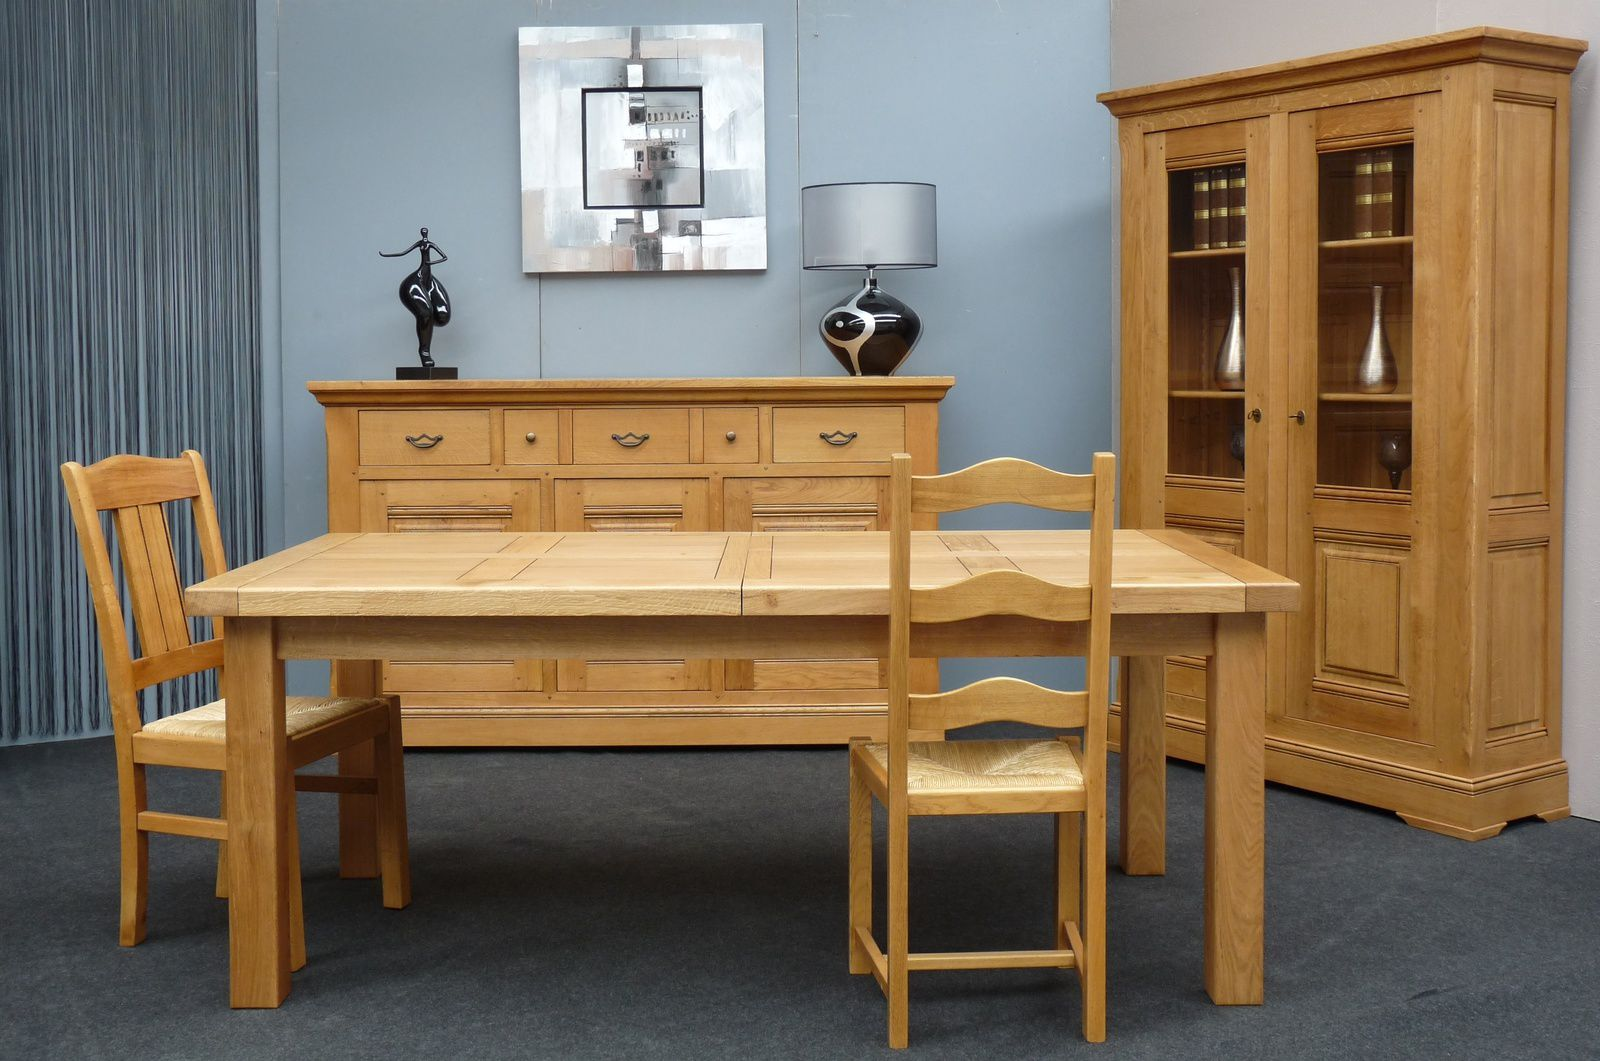 Meubles en bois massif meubles doudard vente de for Salle manger en bois